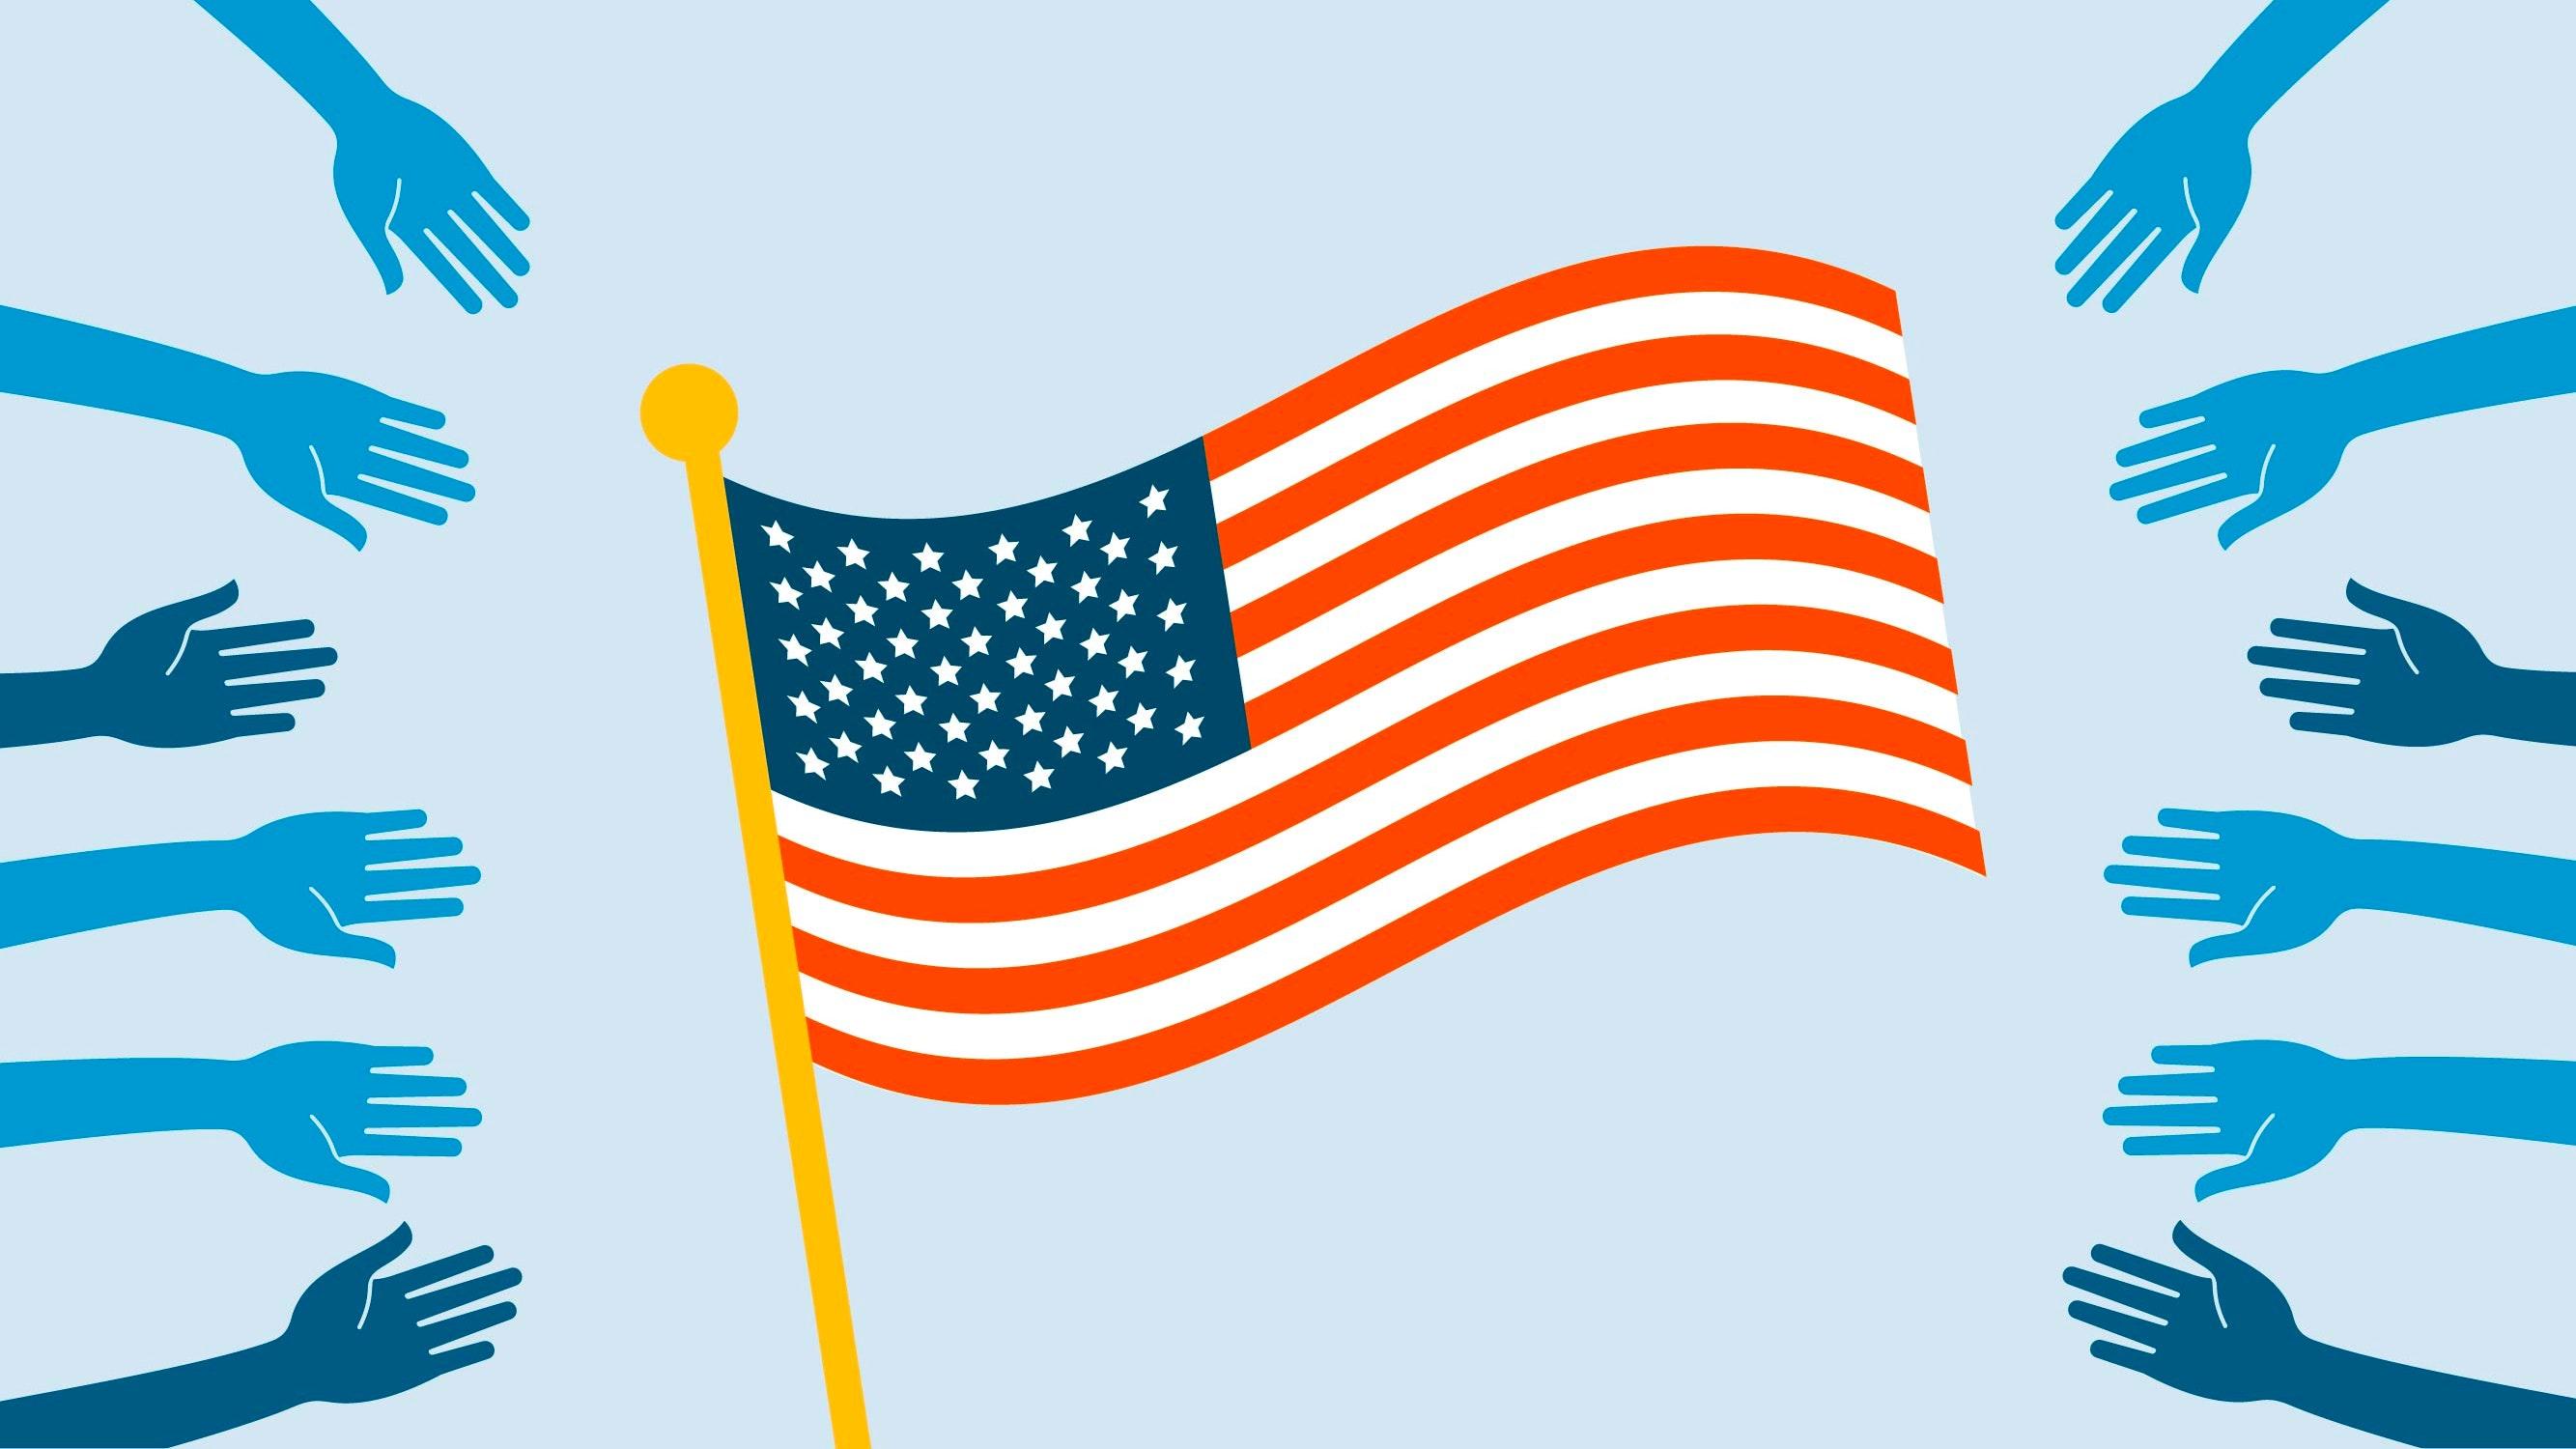 What Unites Americans?